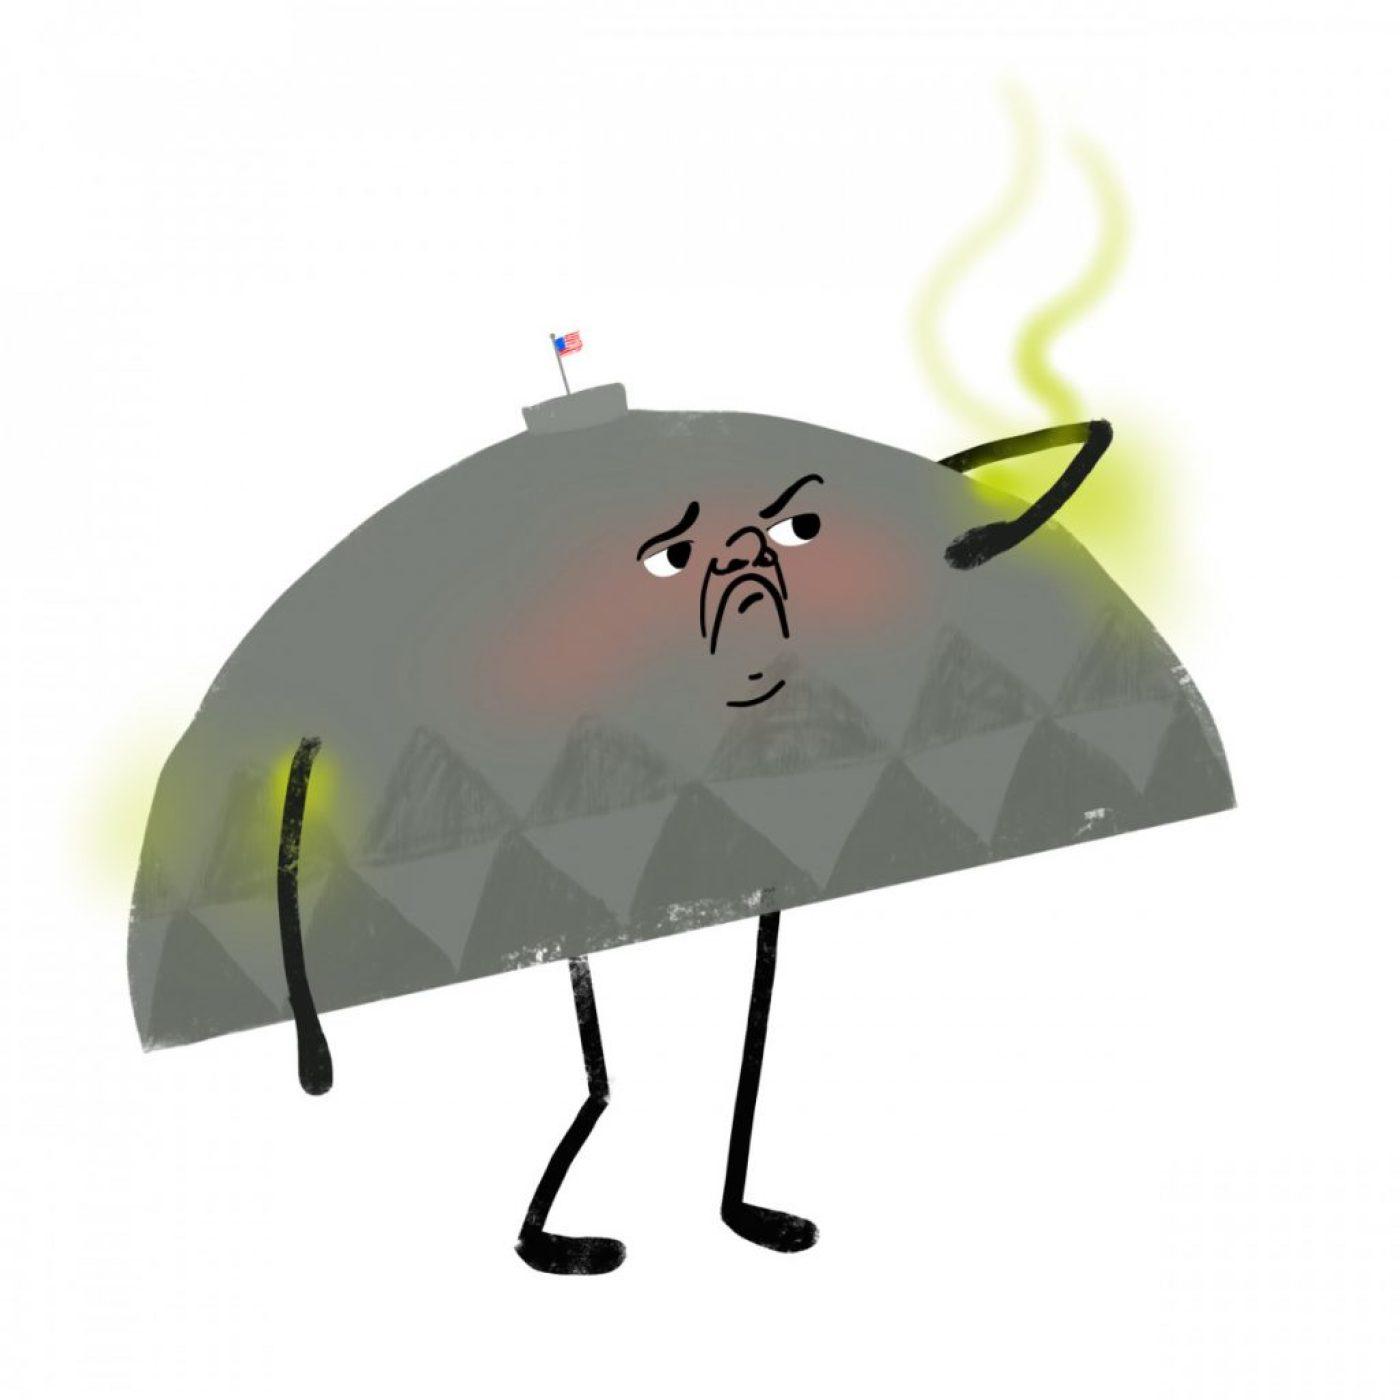 Smelly Tacoma Dome